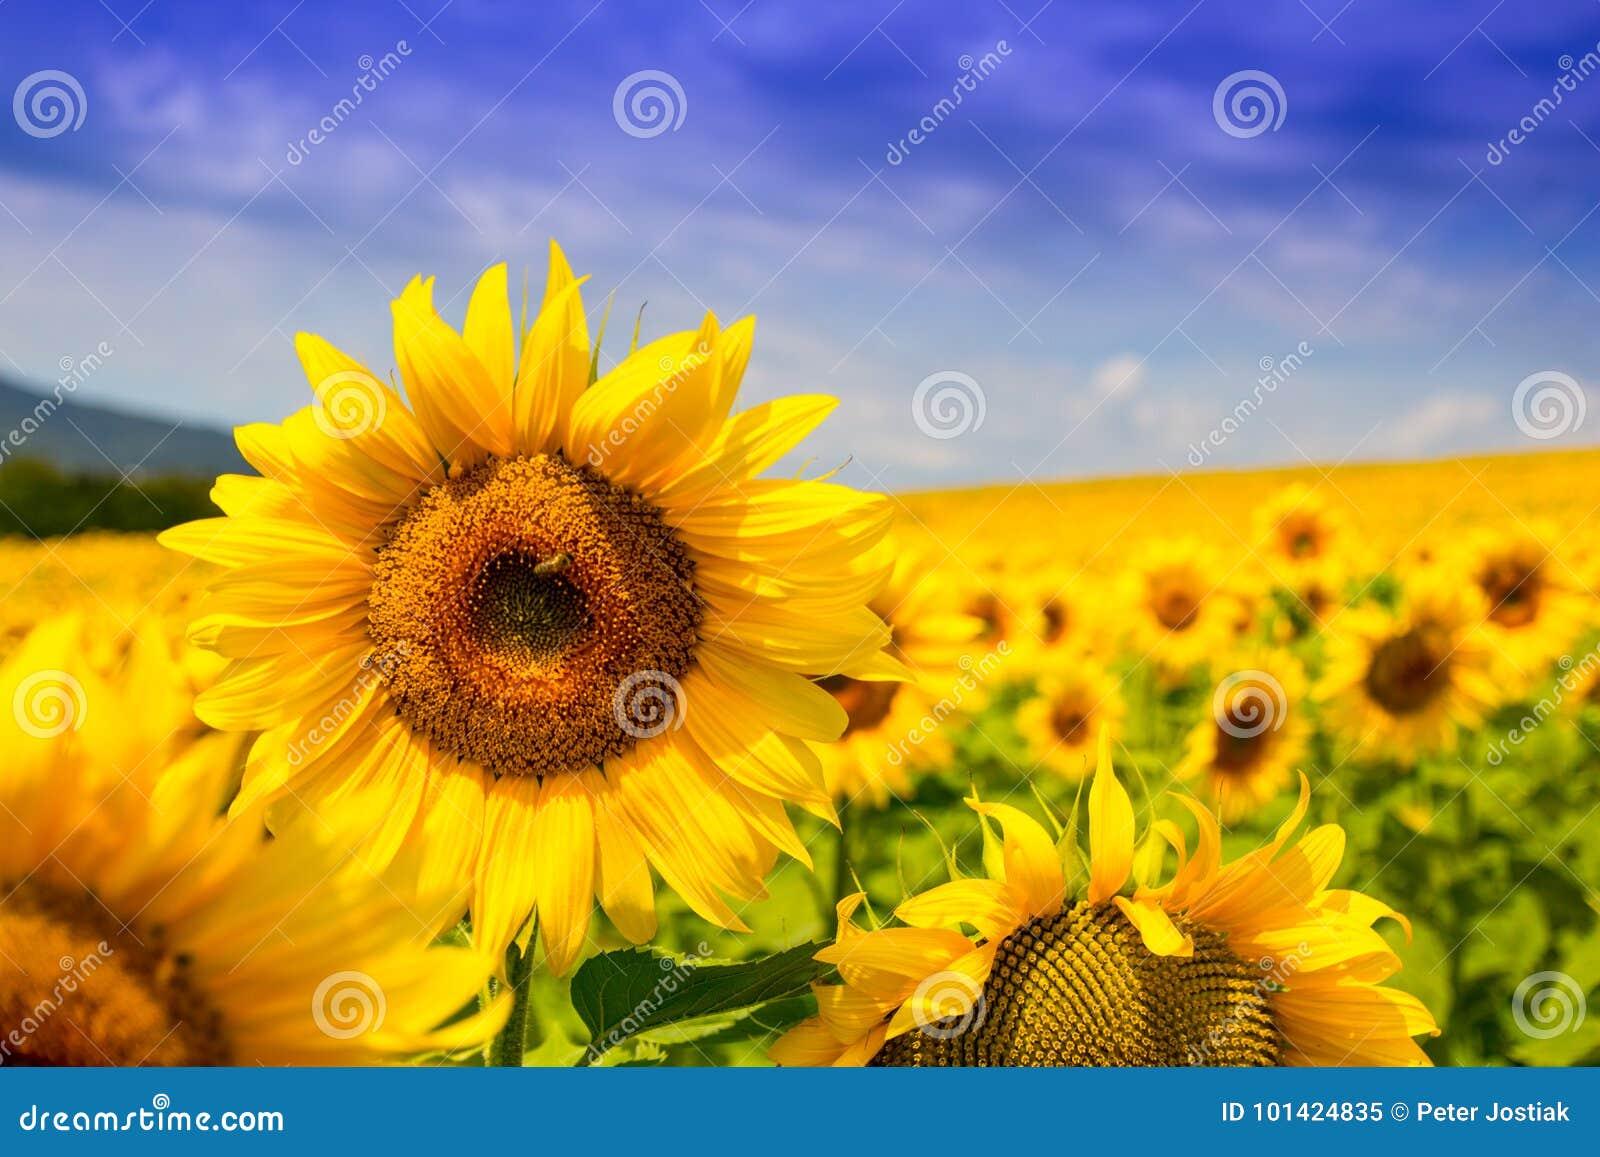 Vista agradable de girasoles amarillos, paisaje de la naturaleza del verano